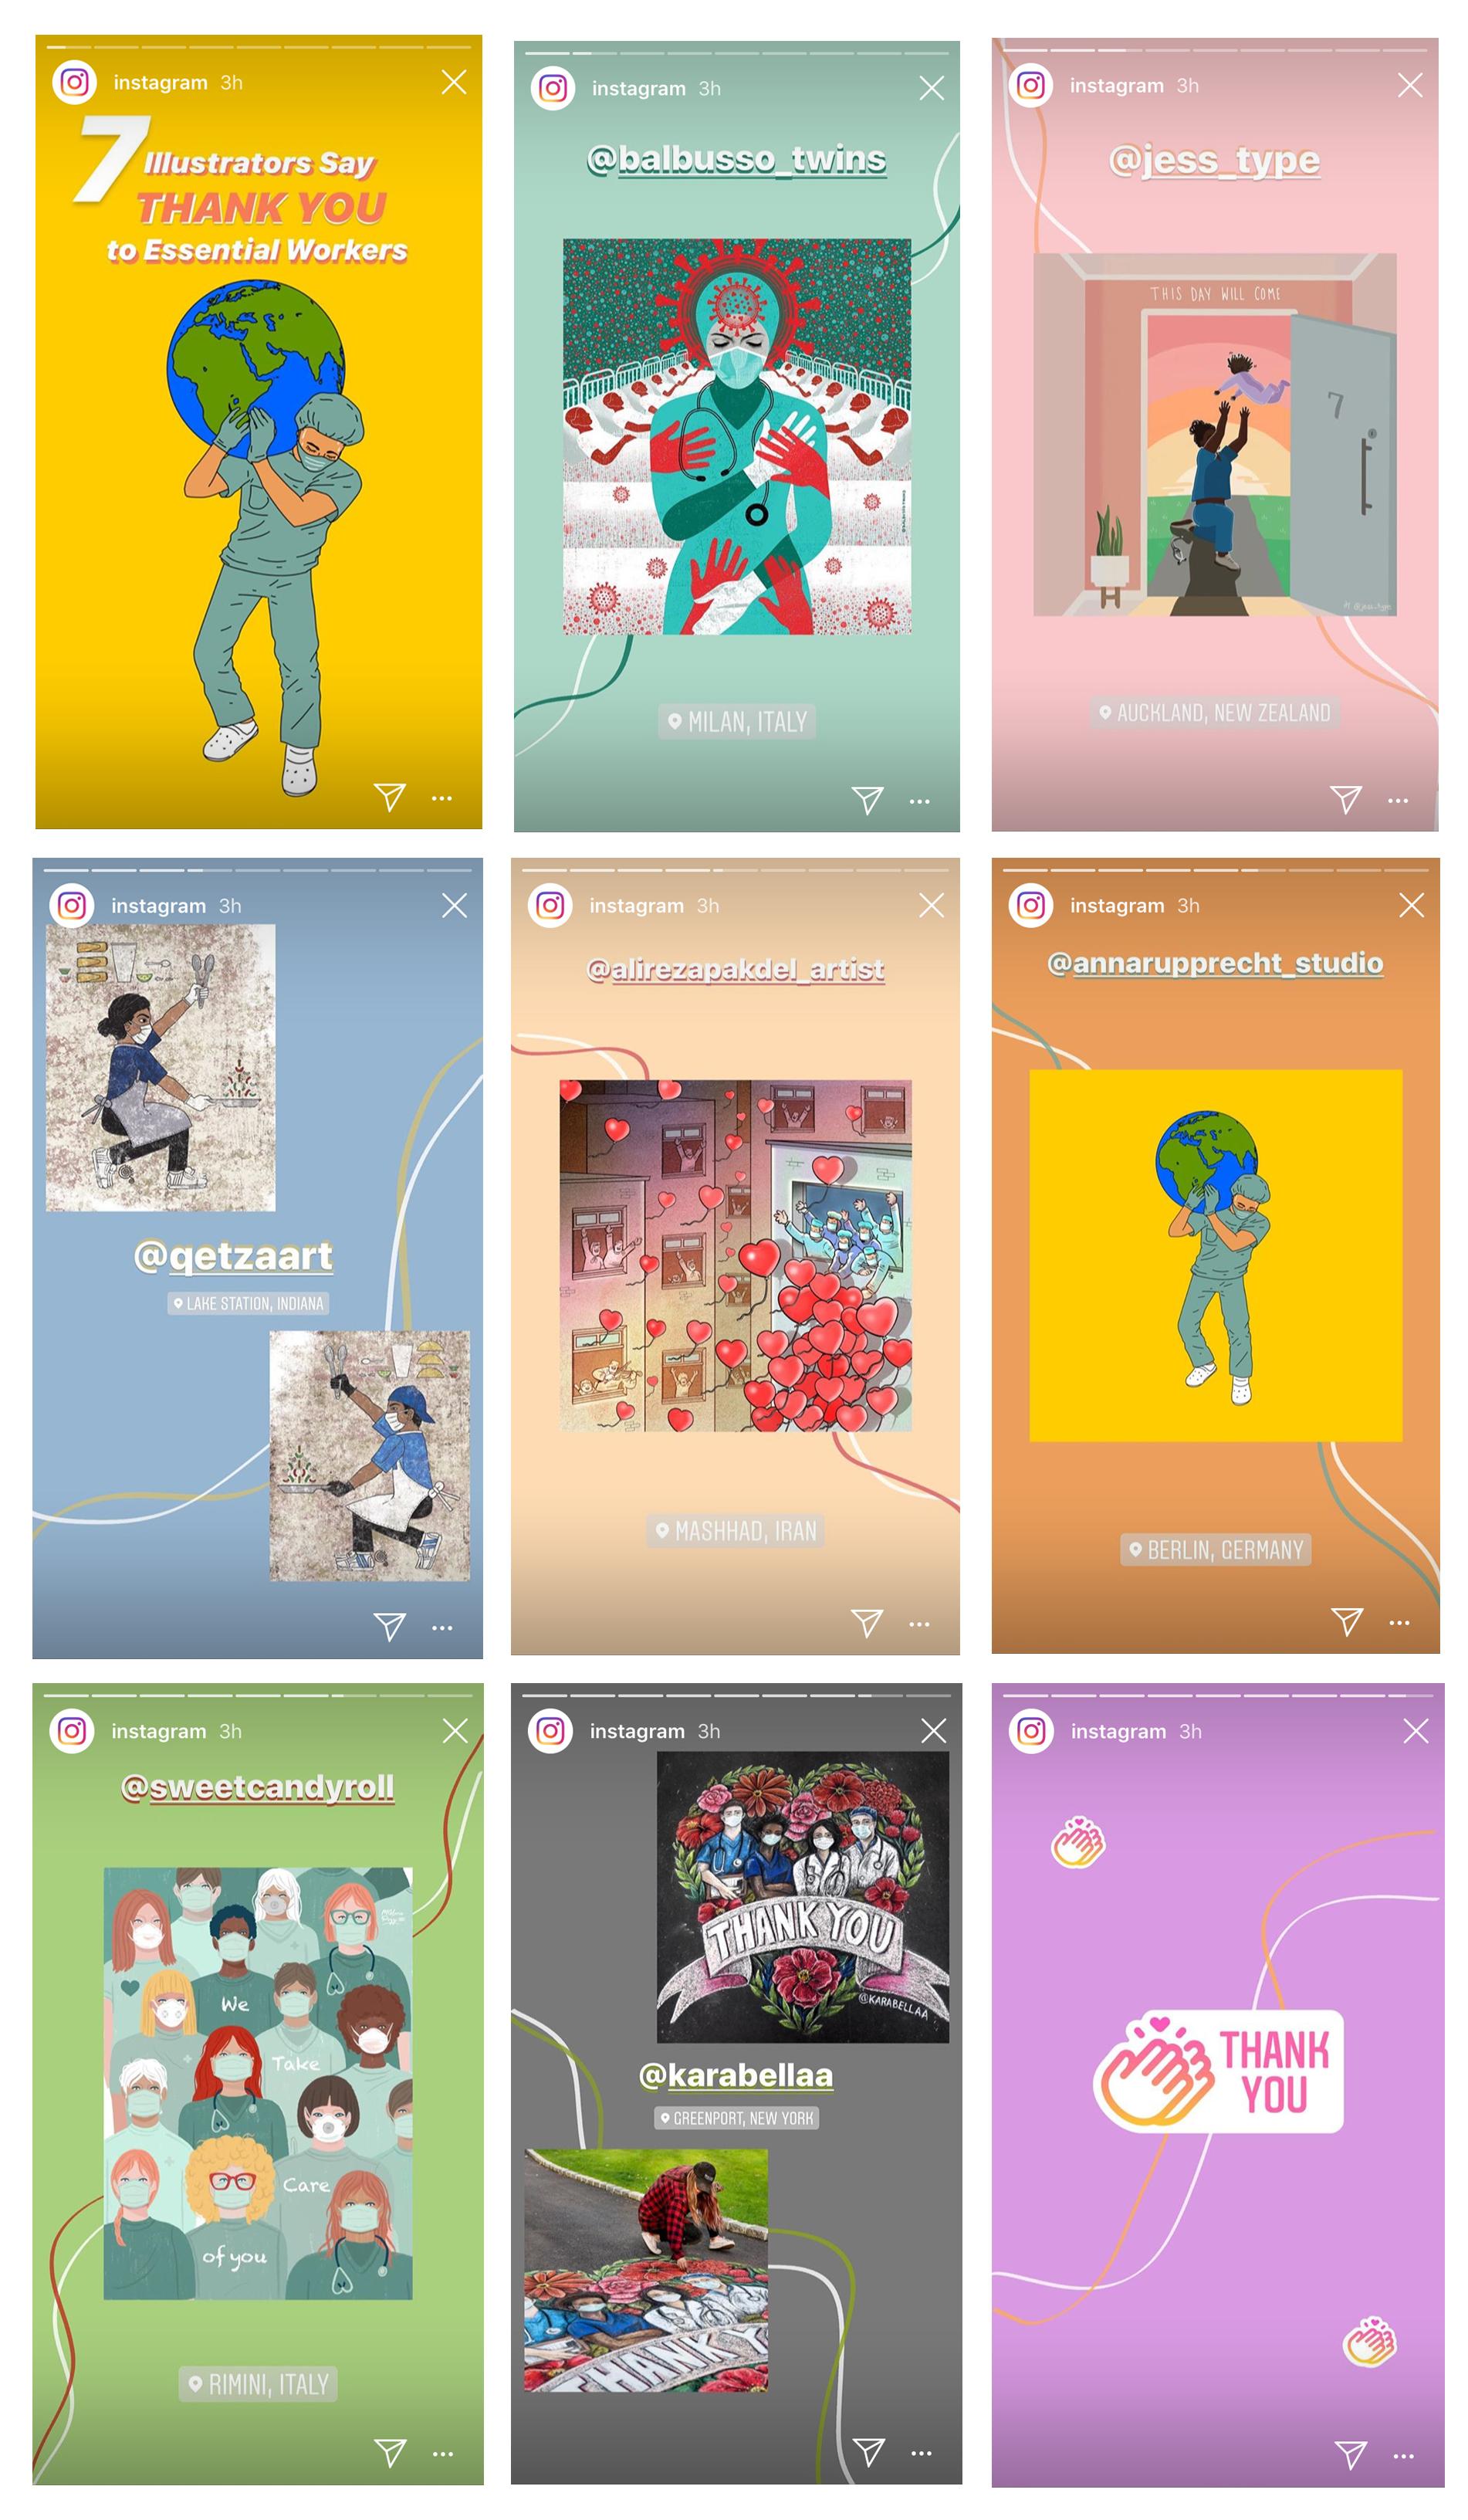 seven-illustrator-feed-instagram-stores